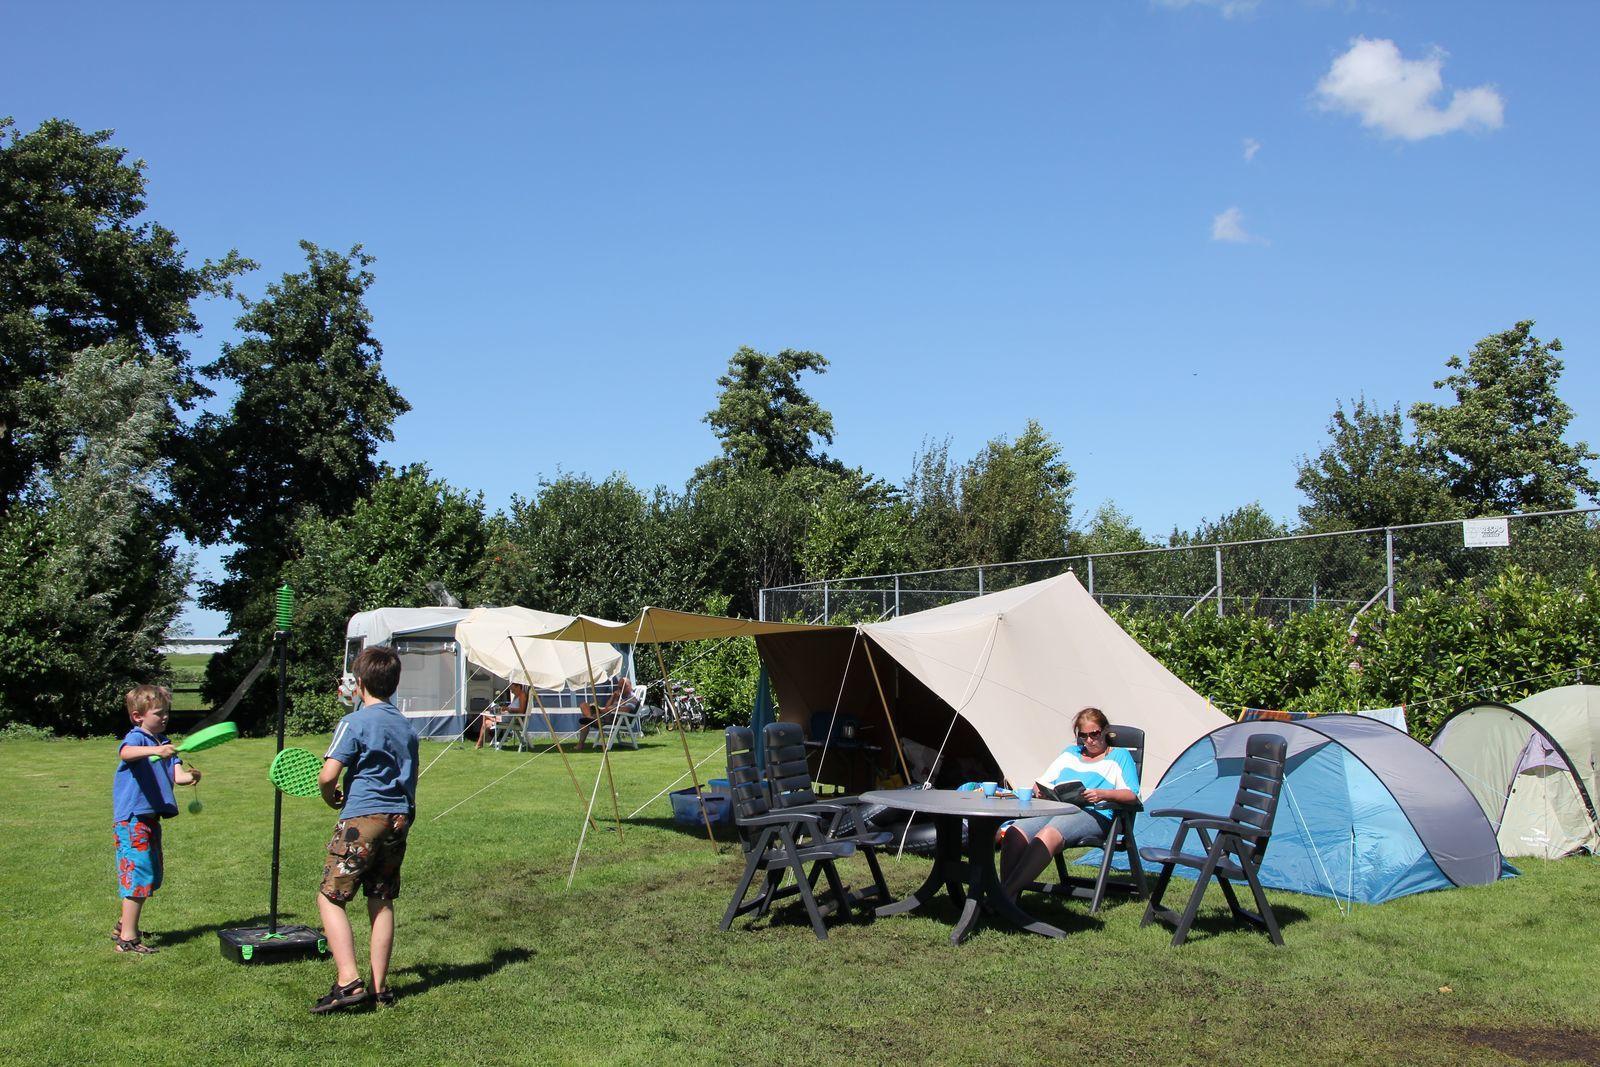 Kampeerplaats: Camper, Caravan of Tent, 10 Amp